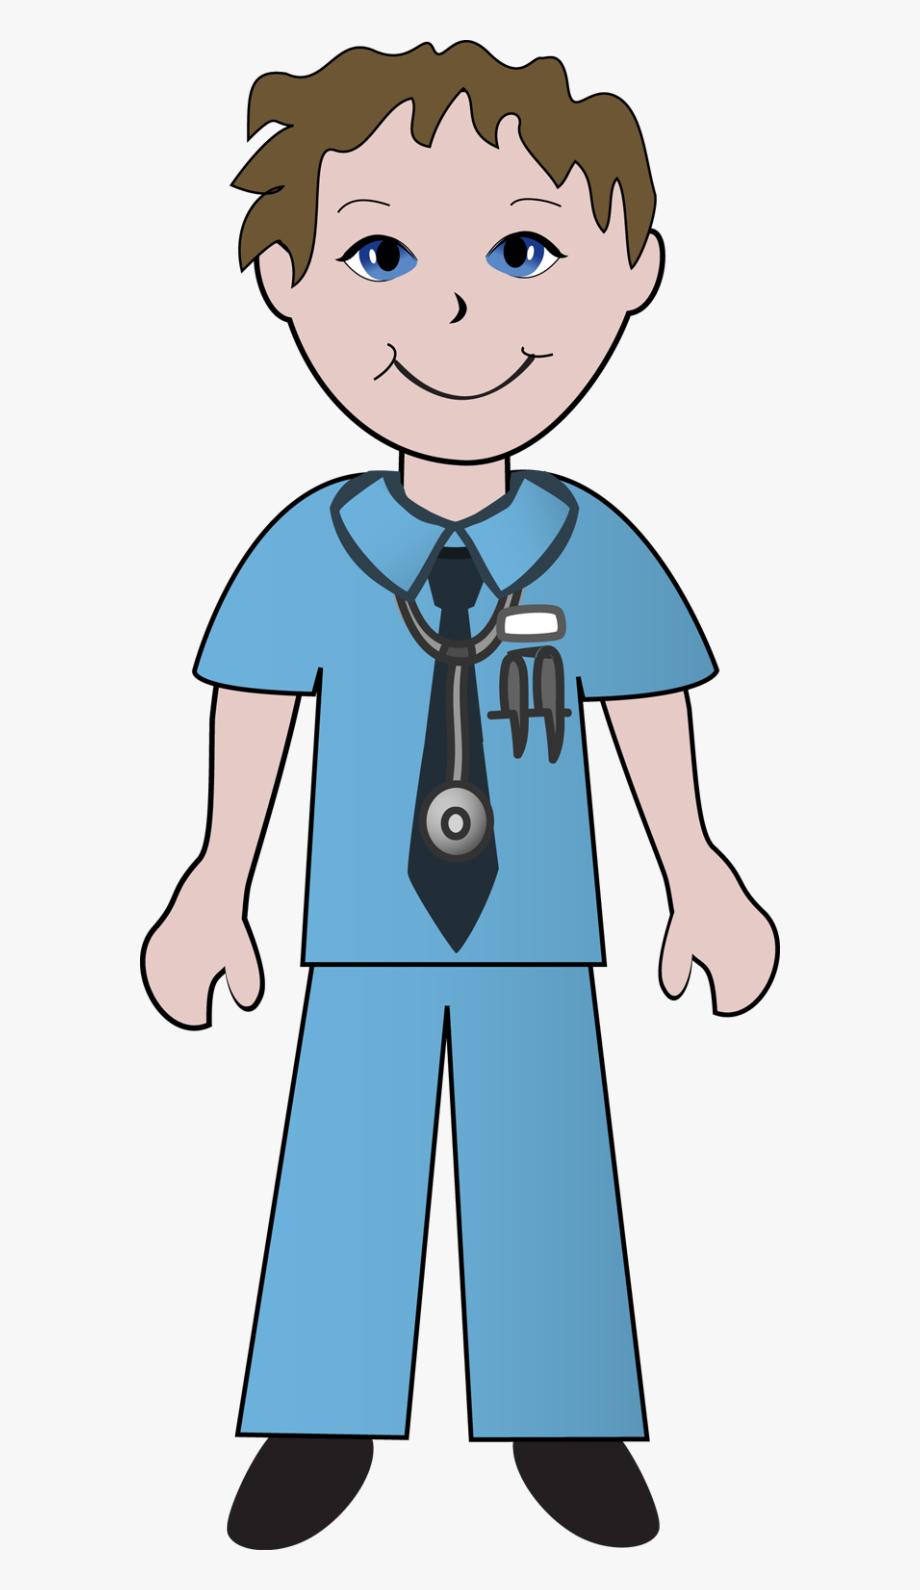 Nursing nurse clipart.